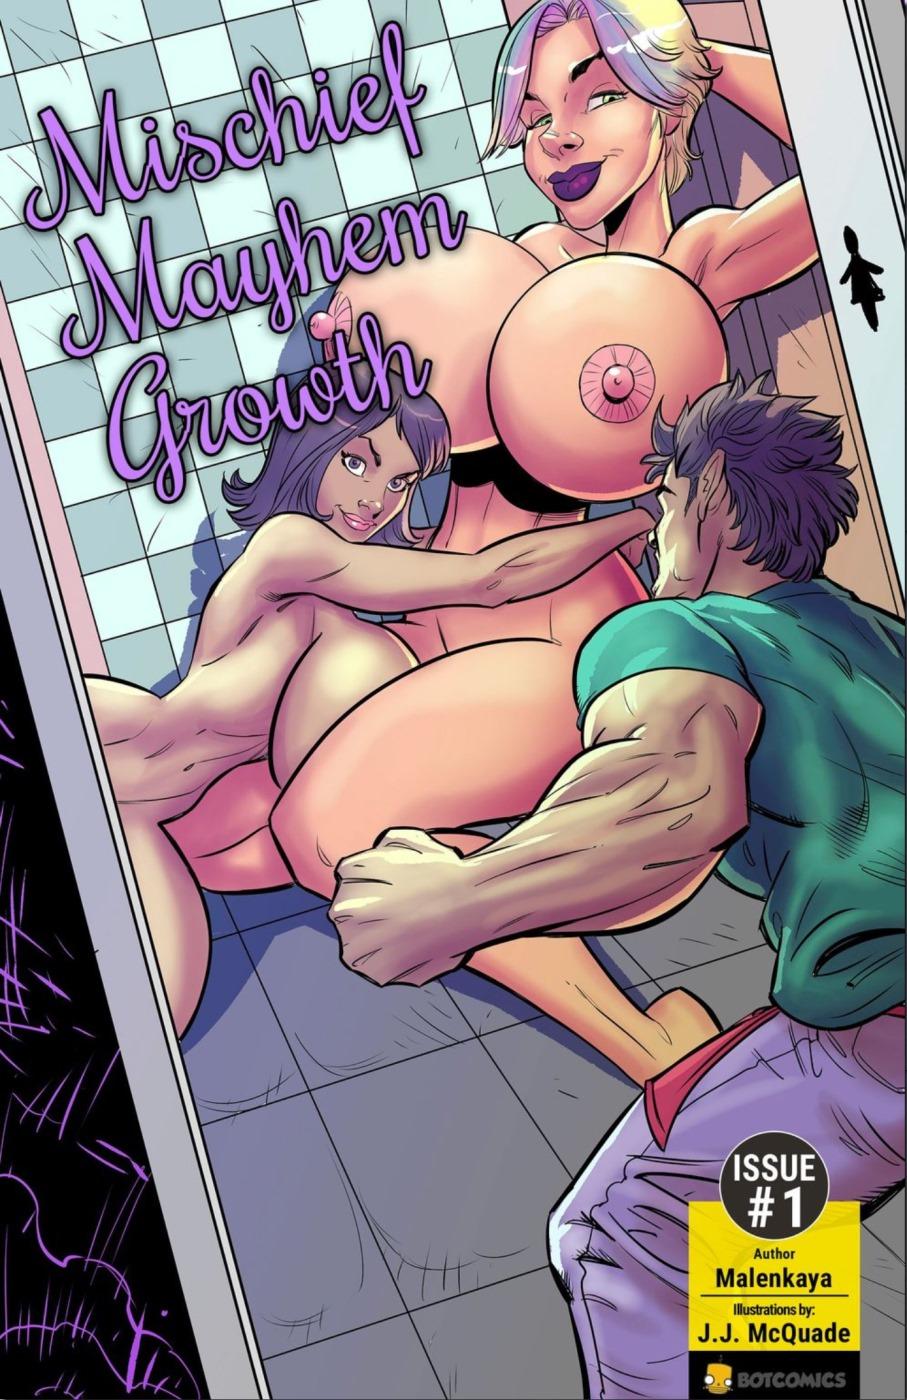 Mischief, Mayhem, Growth porn comics 8 muses